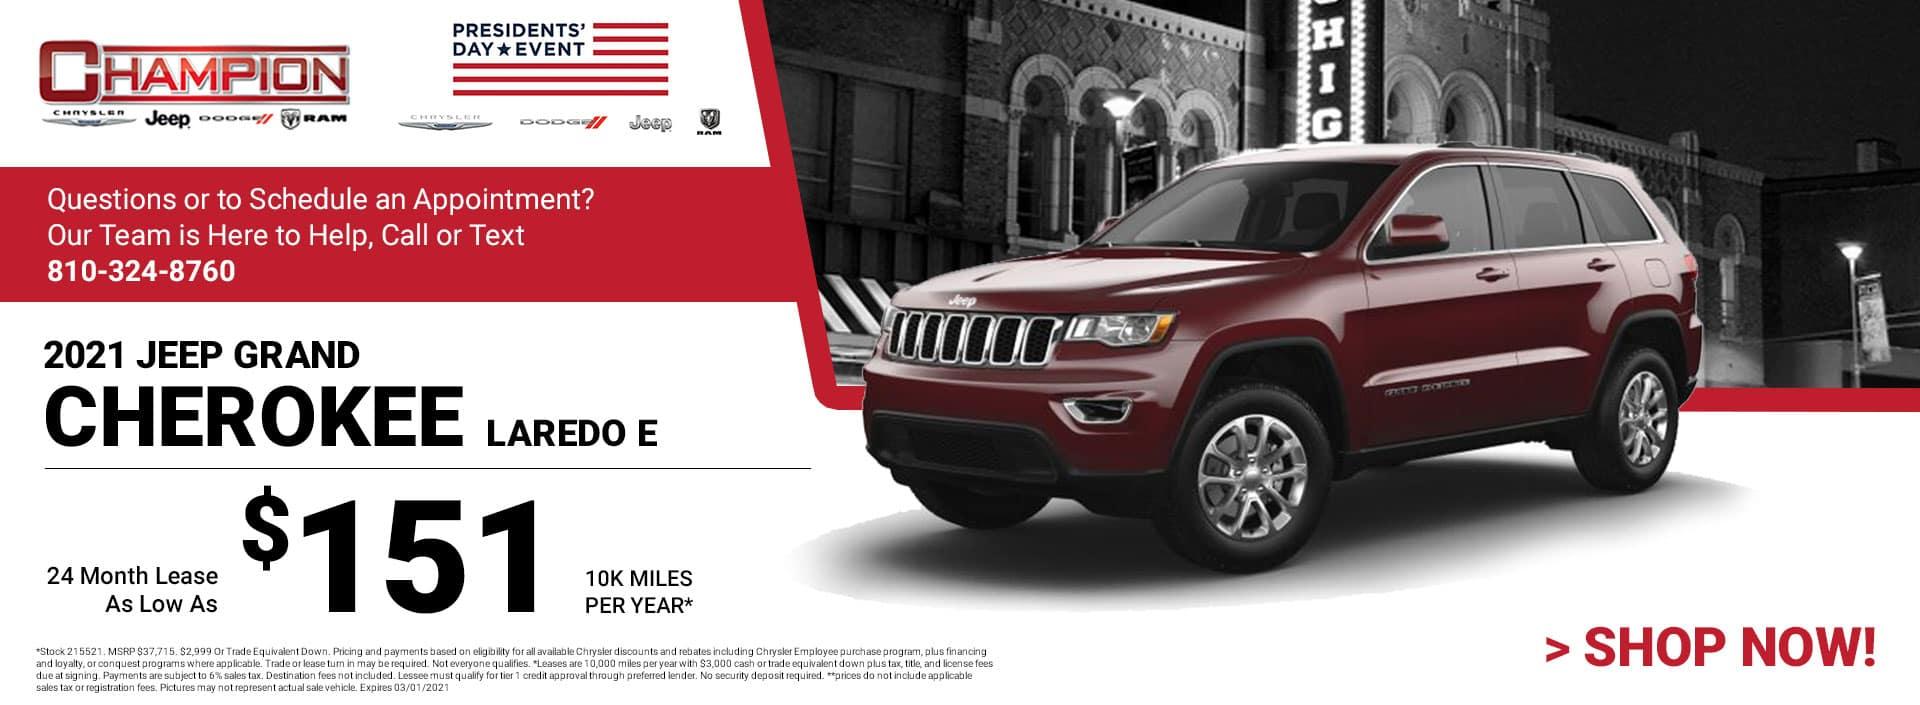 2021 Grand Cherokee Laredo E